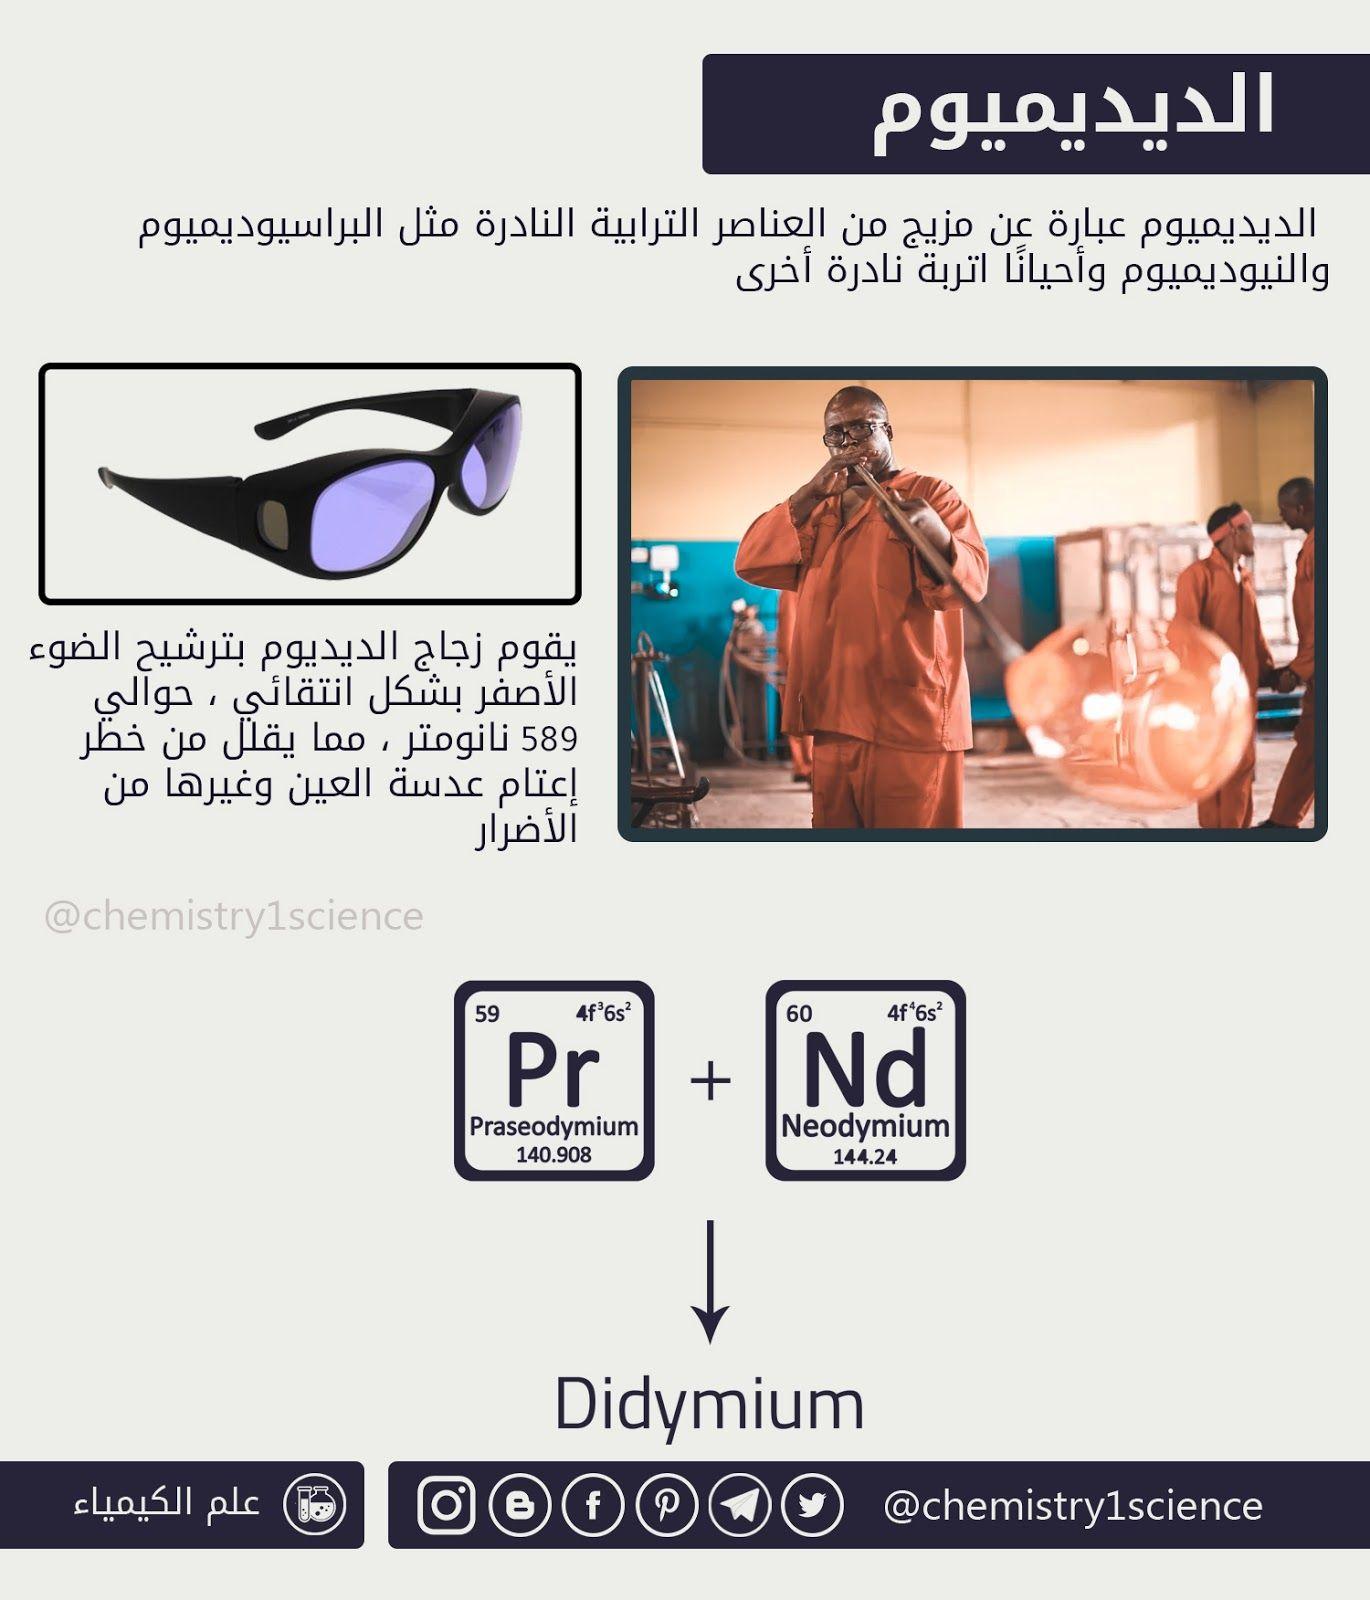 الديديميوم حقائق واستخدامات Didymium Movie Posters Movies Poster